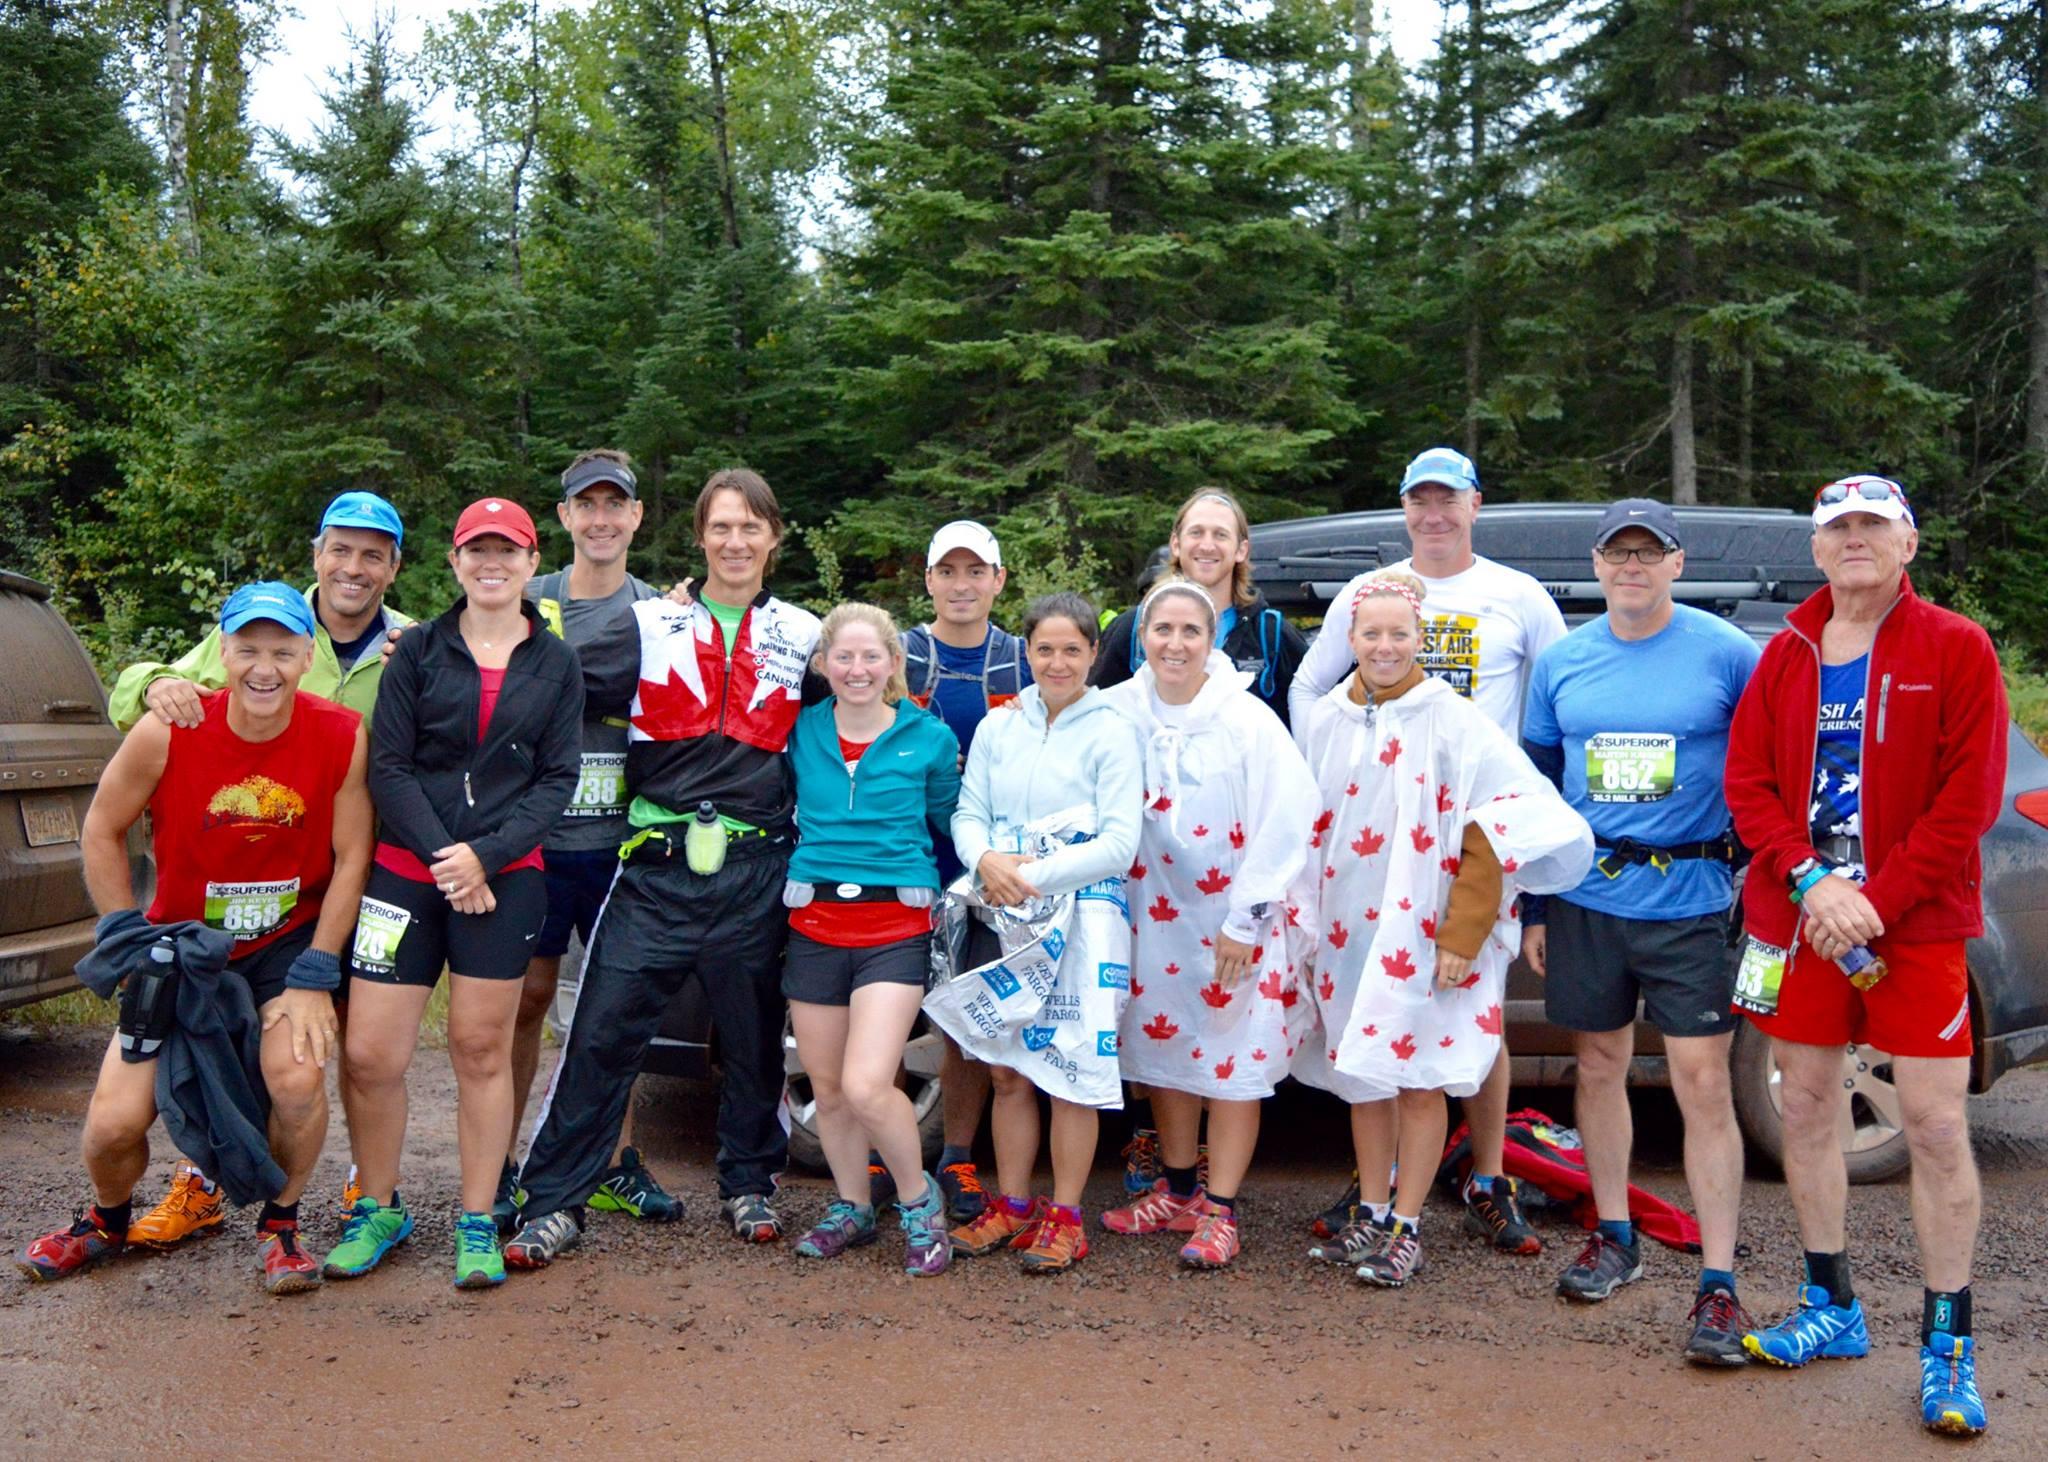 Thunder Bay group_pre race pic_SuperiorTrailMarathon_2016